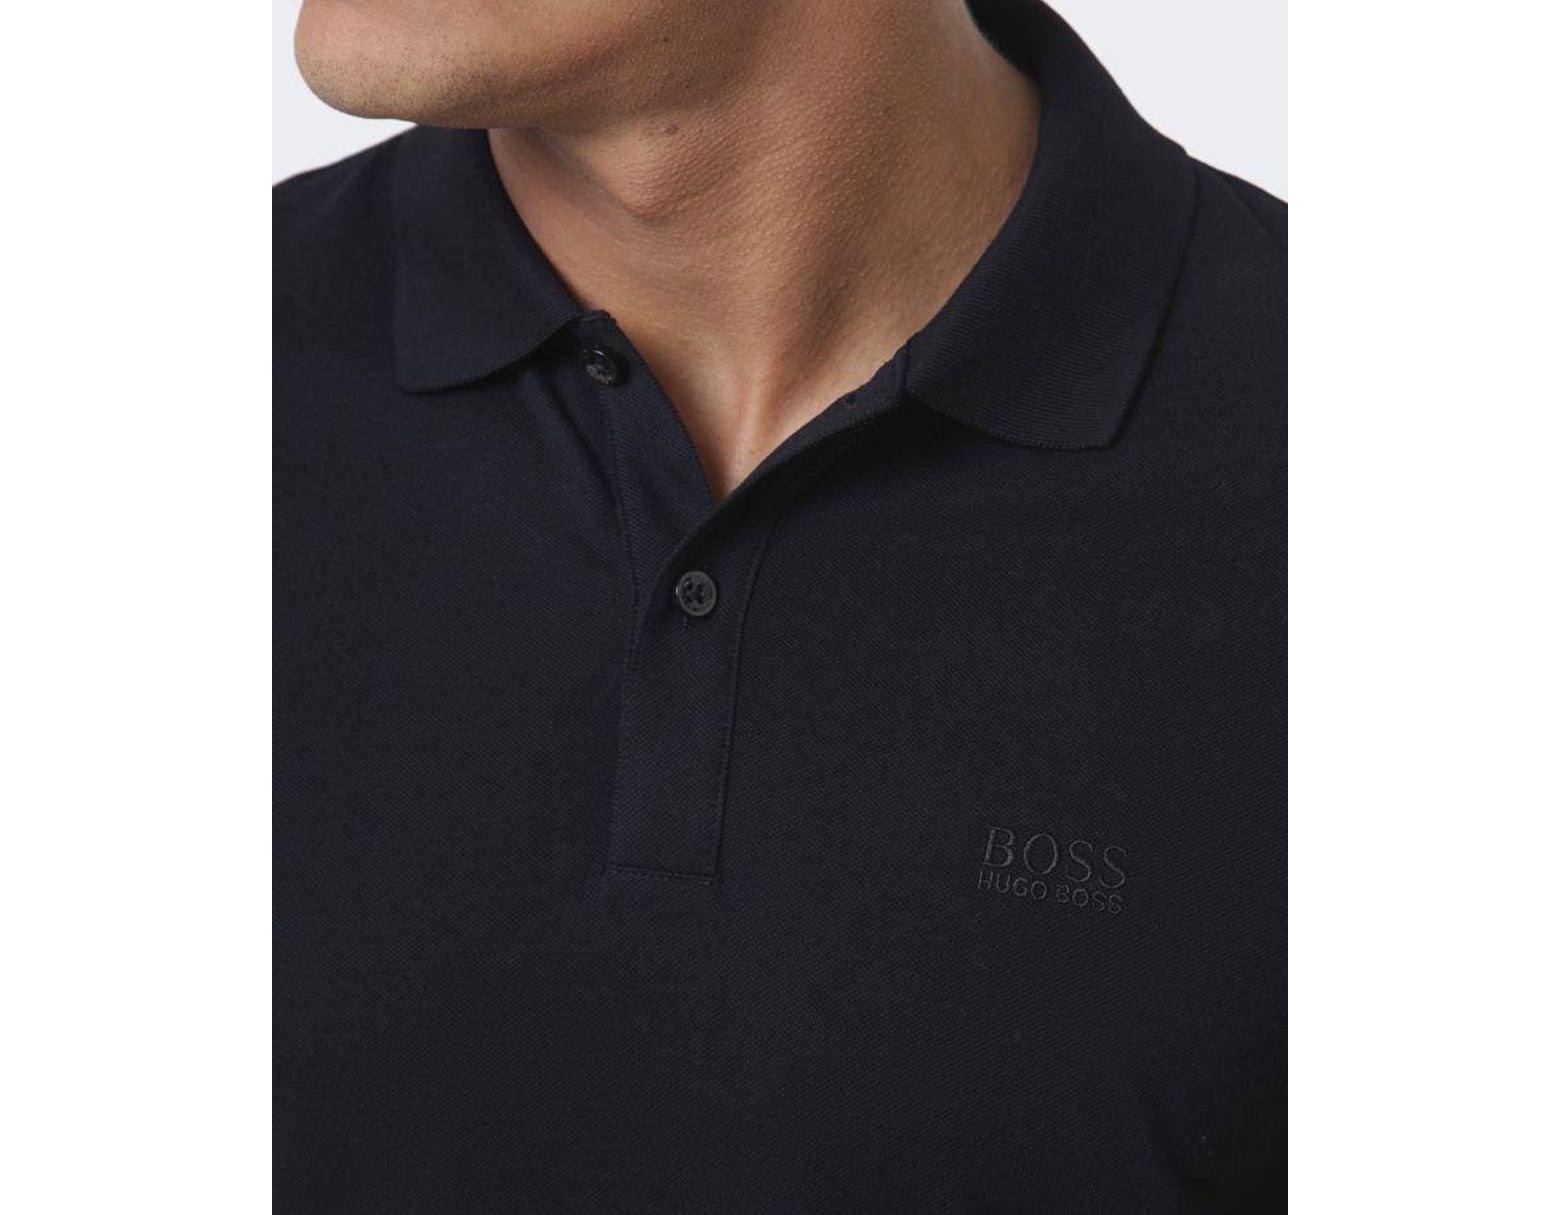 8d602109 BOSS Pallas Logo Polo Shirt in Black for Men - Save 19% - Lyst